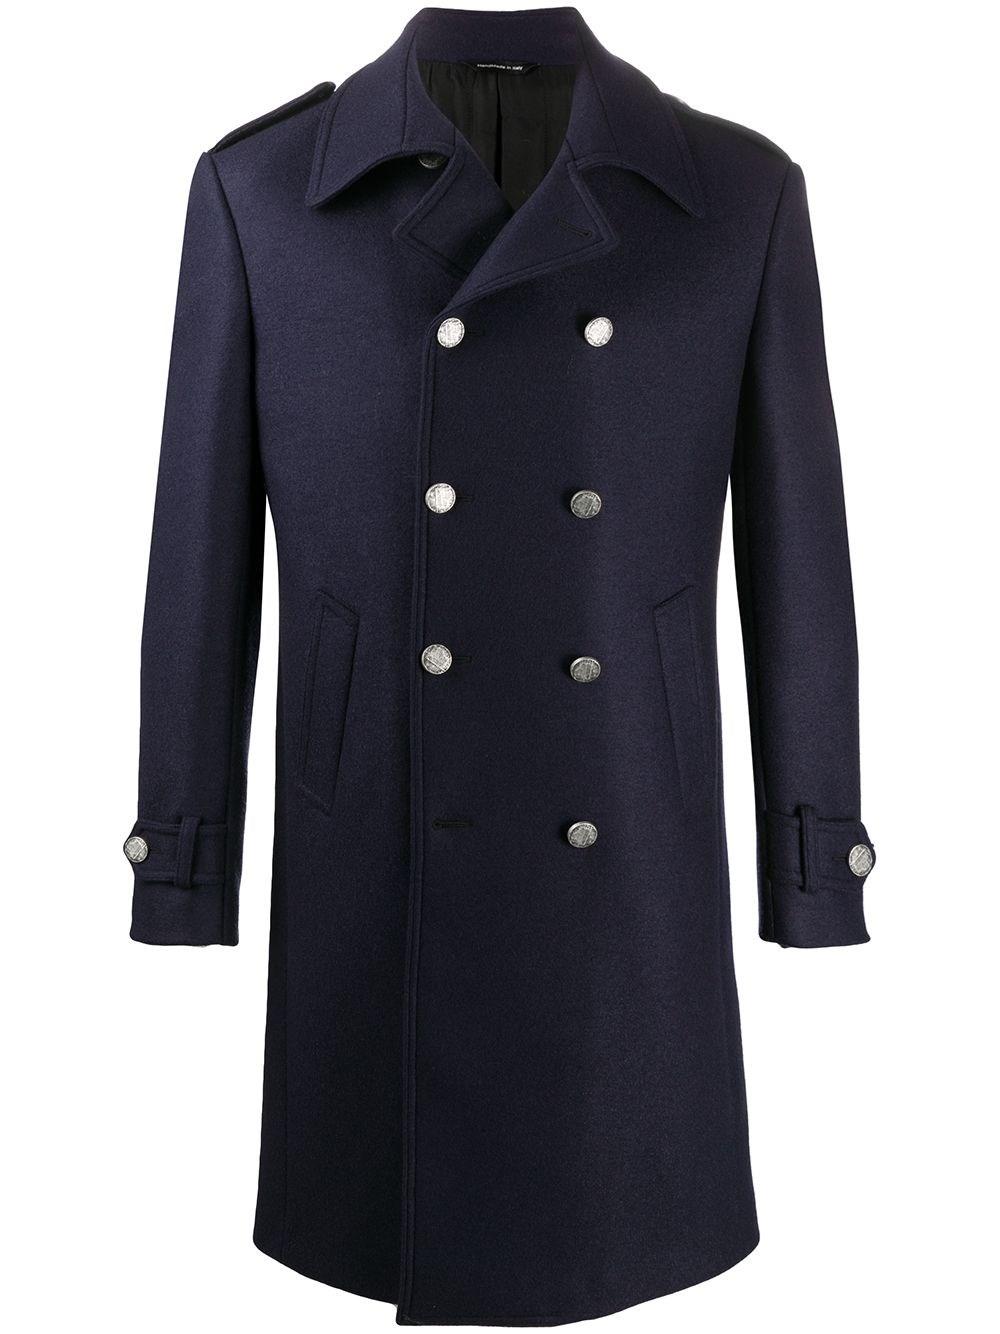 TONELLO Double-Breasted Tailored Coat